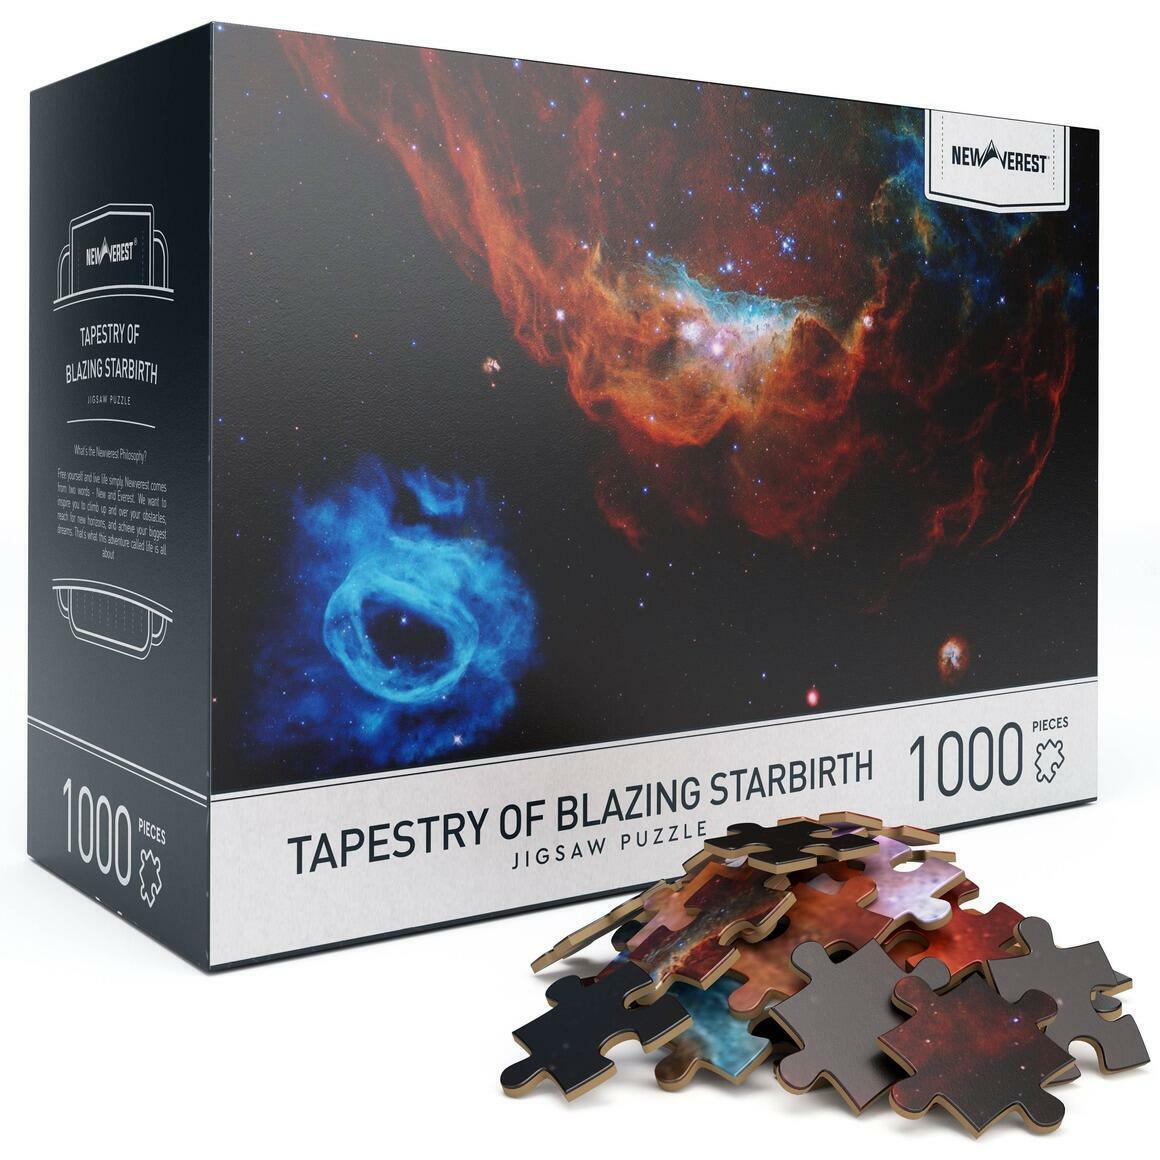 1000 pcs Tapestry of Blazing Starbirth Jigsaw Puzzle | Trada Marketplace